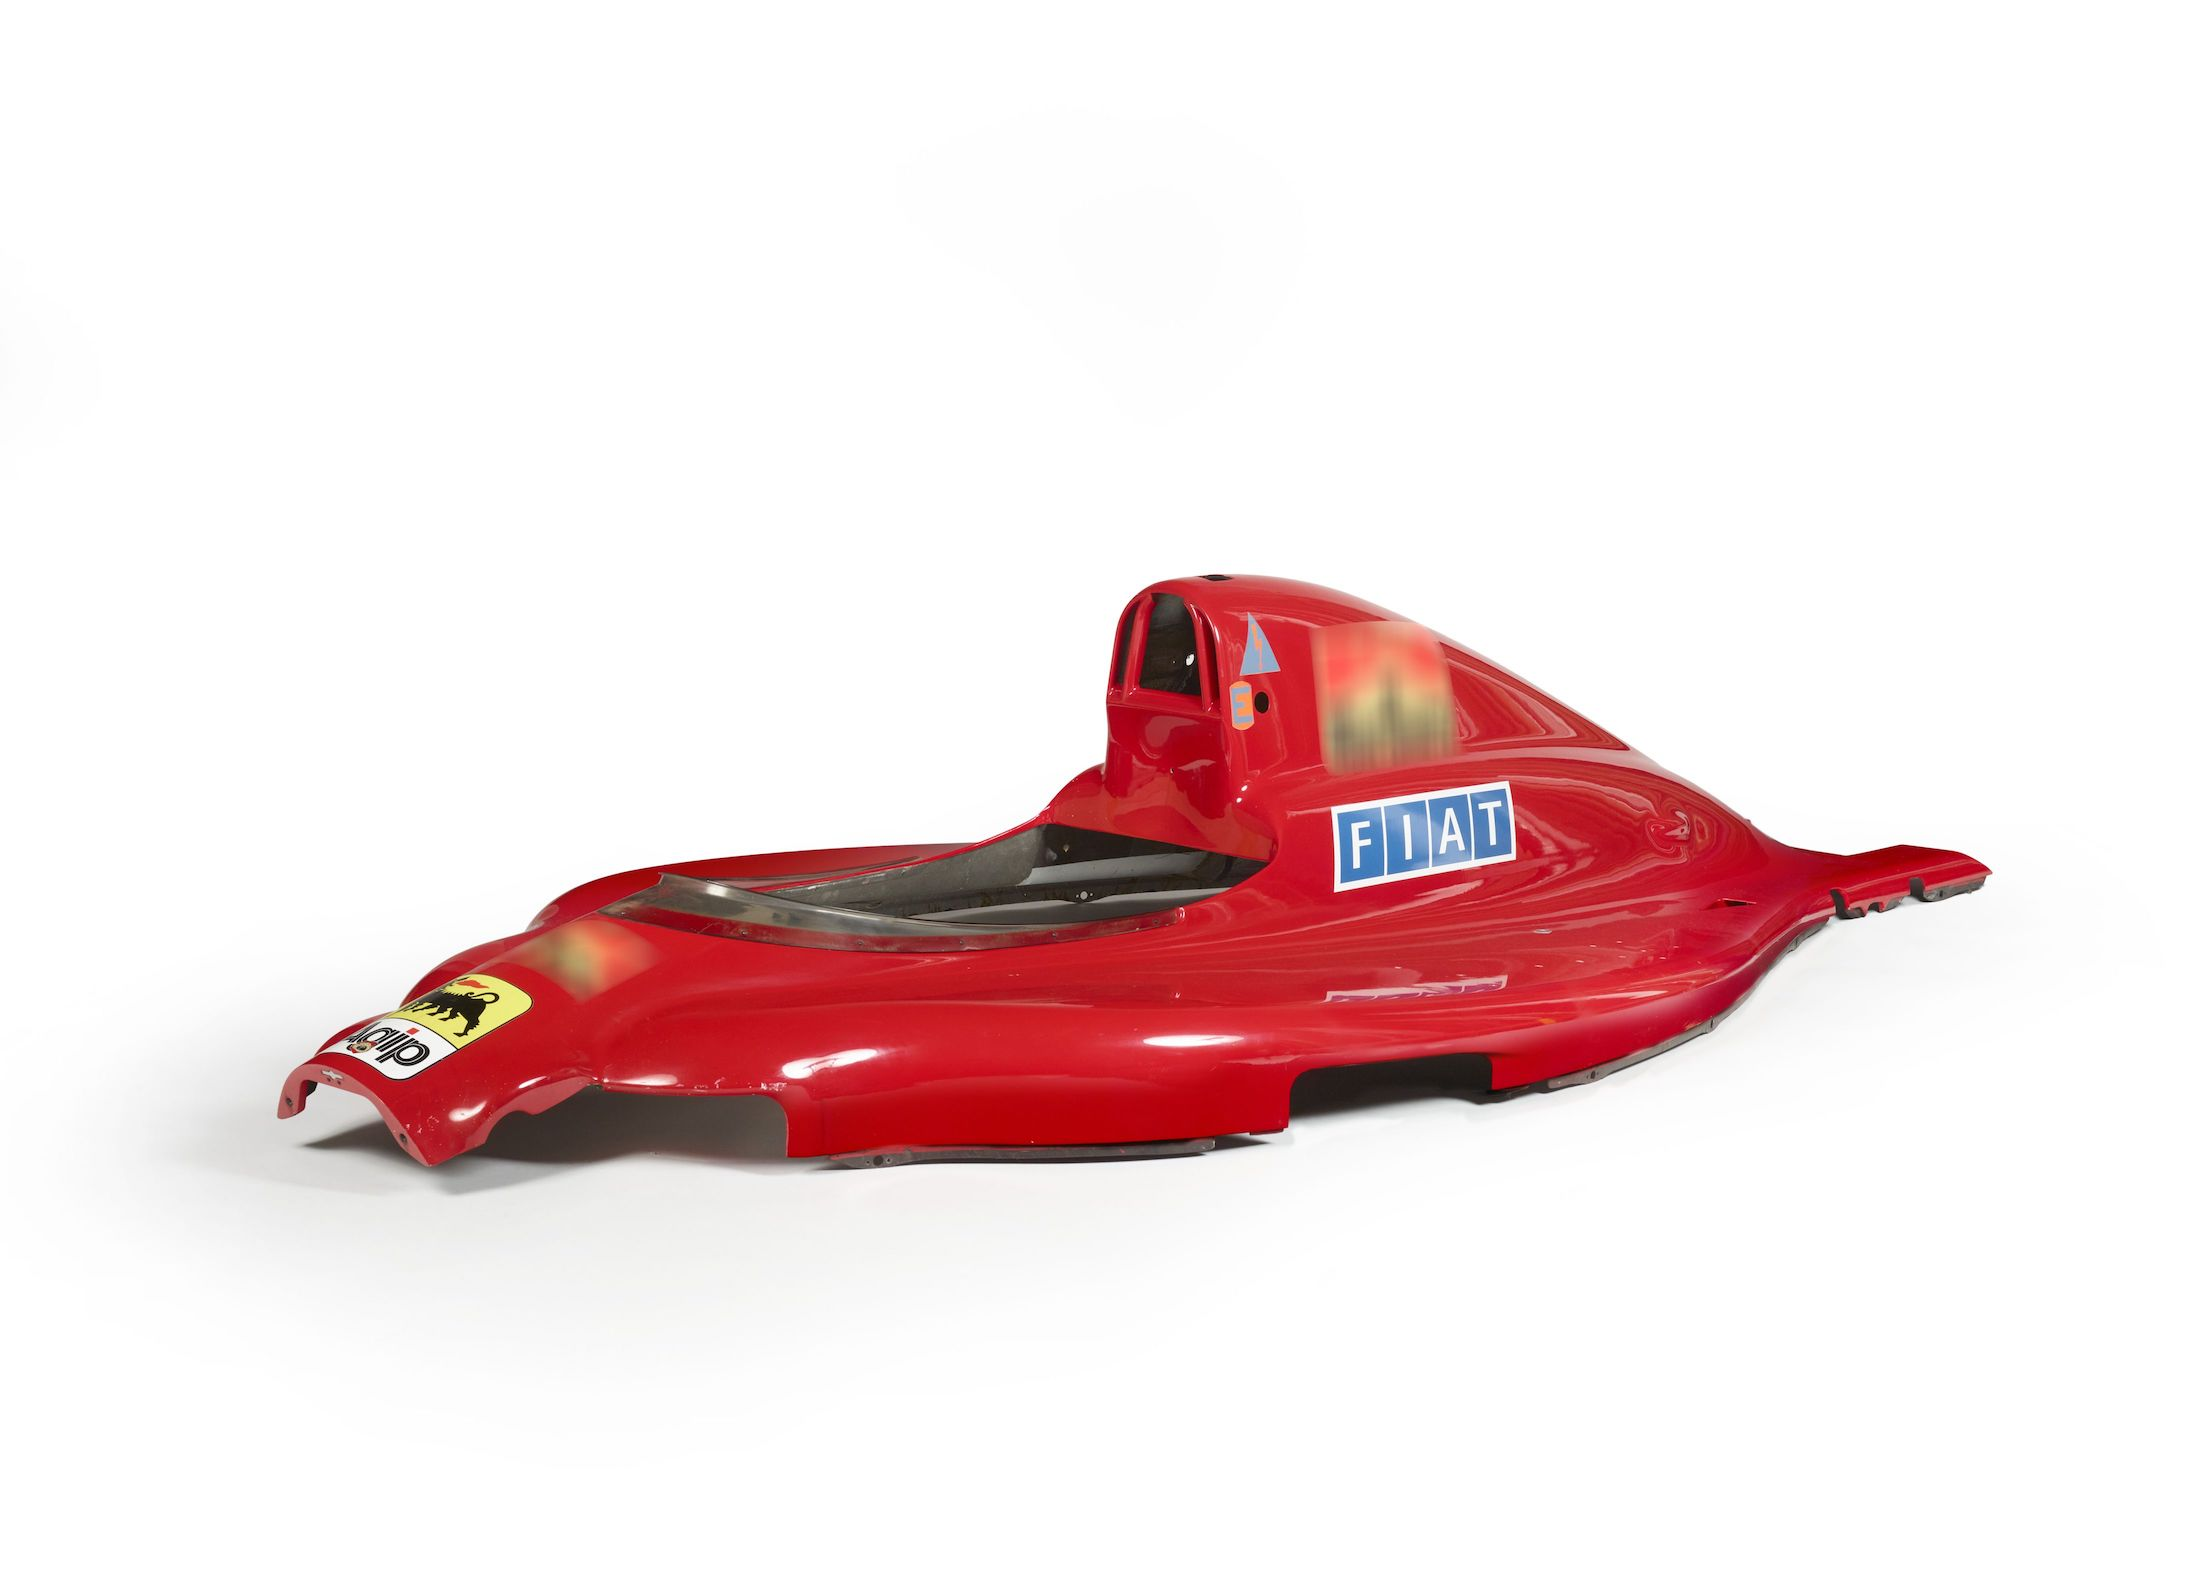 Ferrari 641 Formula 1 Car Body Cover